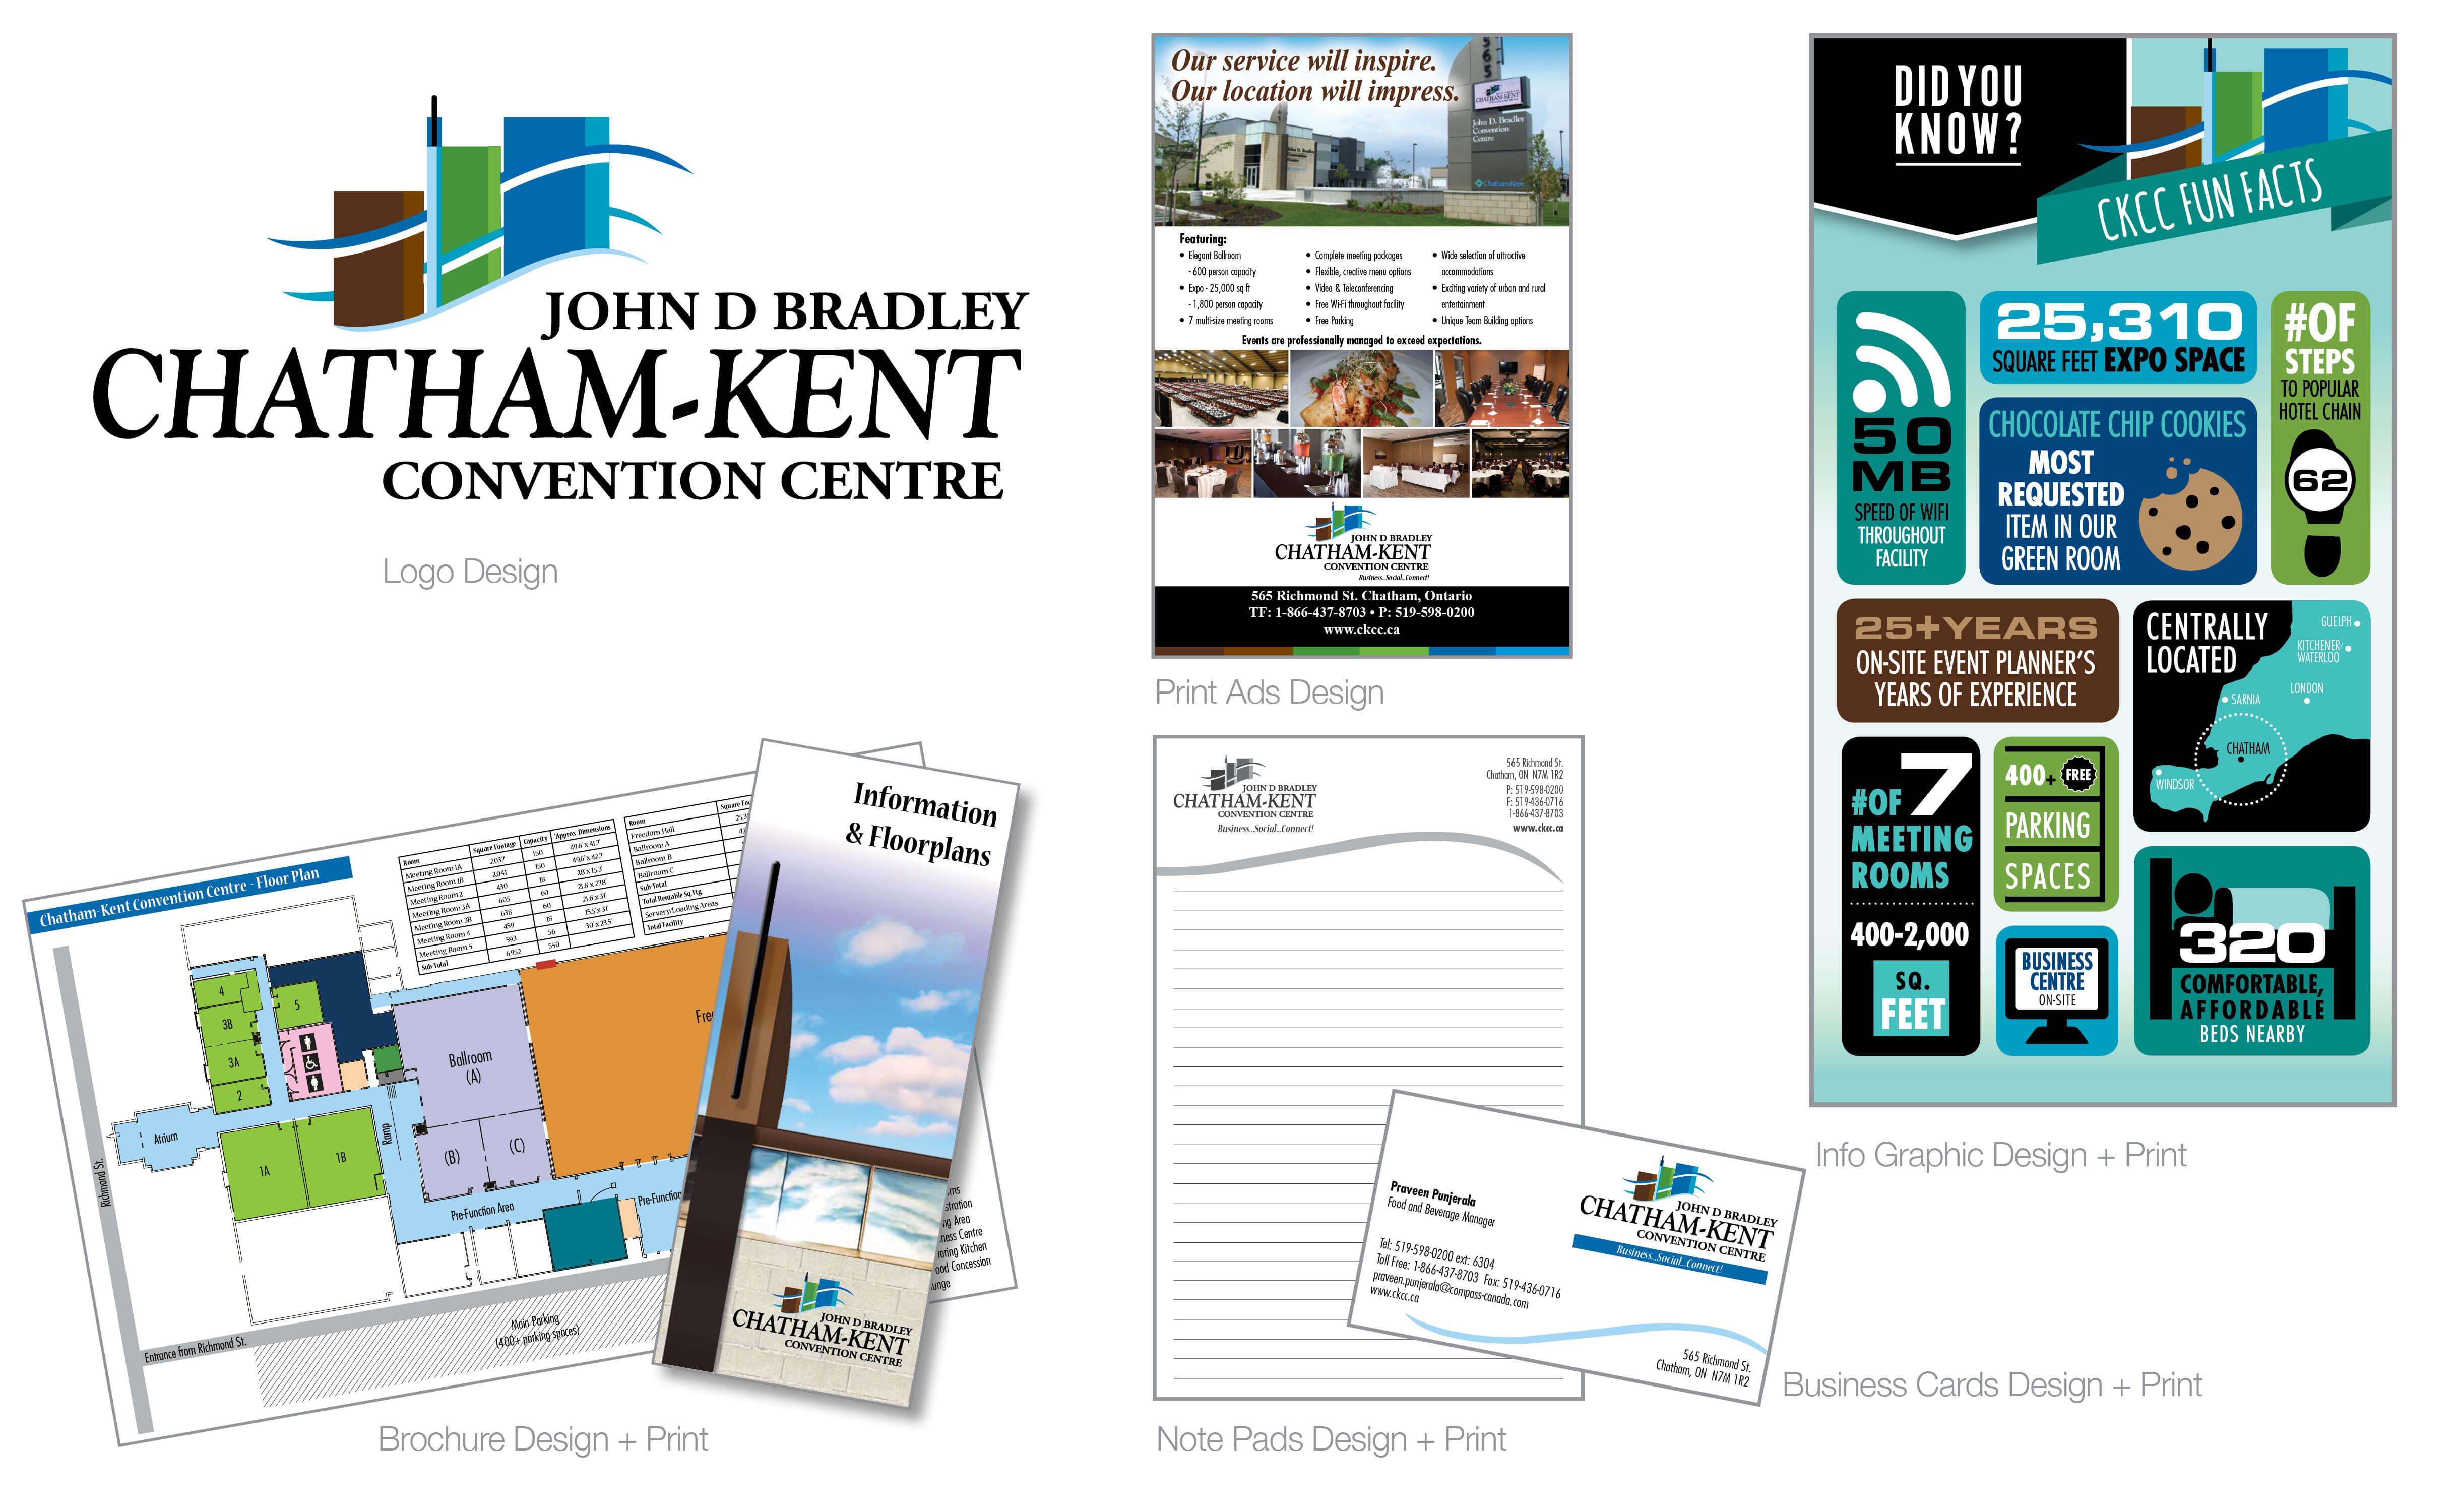 John D Bradley Chatham-Kent Convention Centre